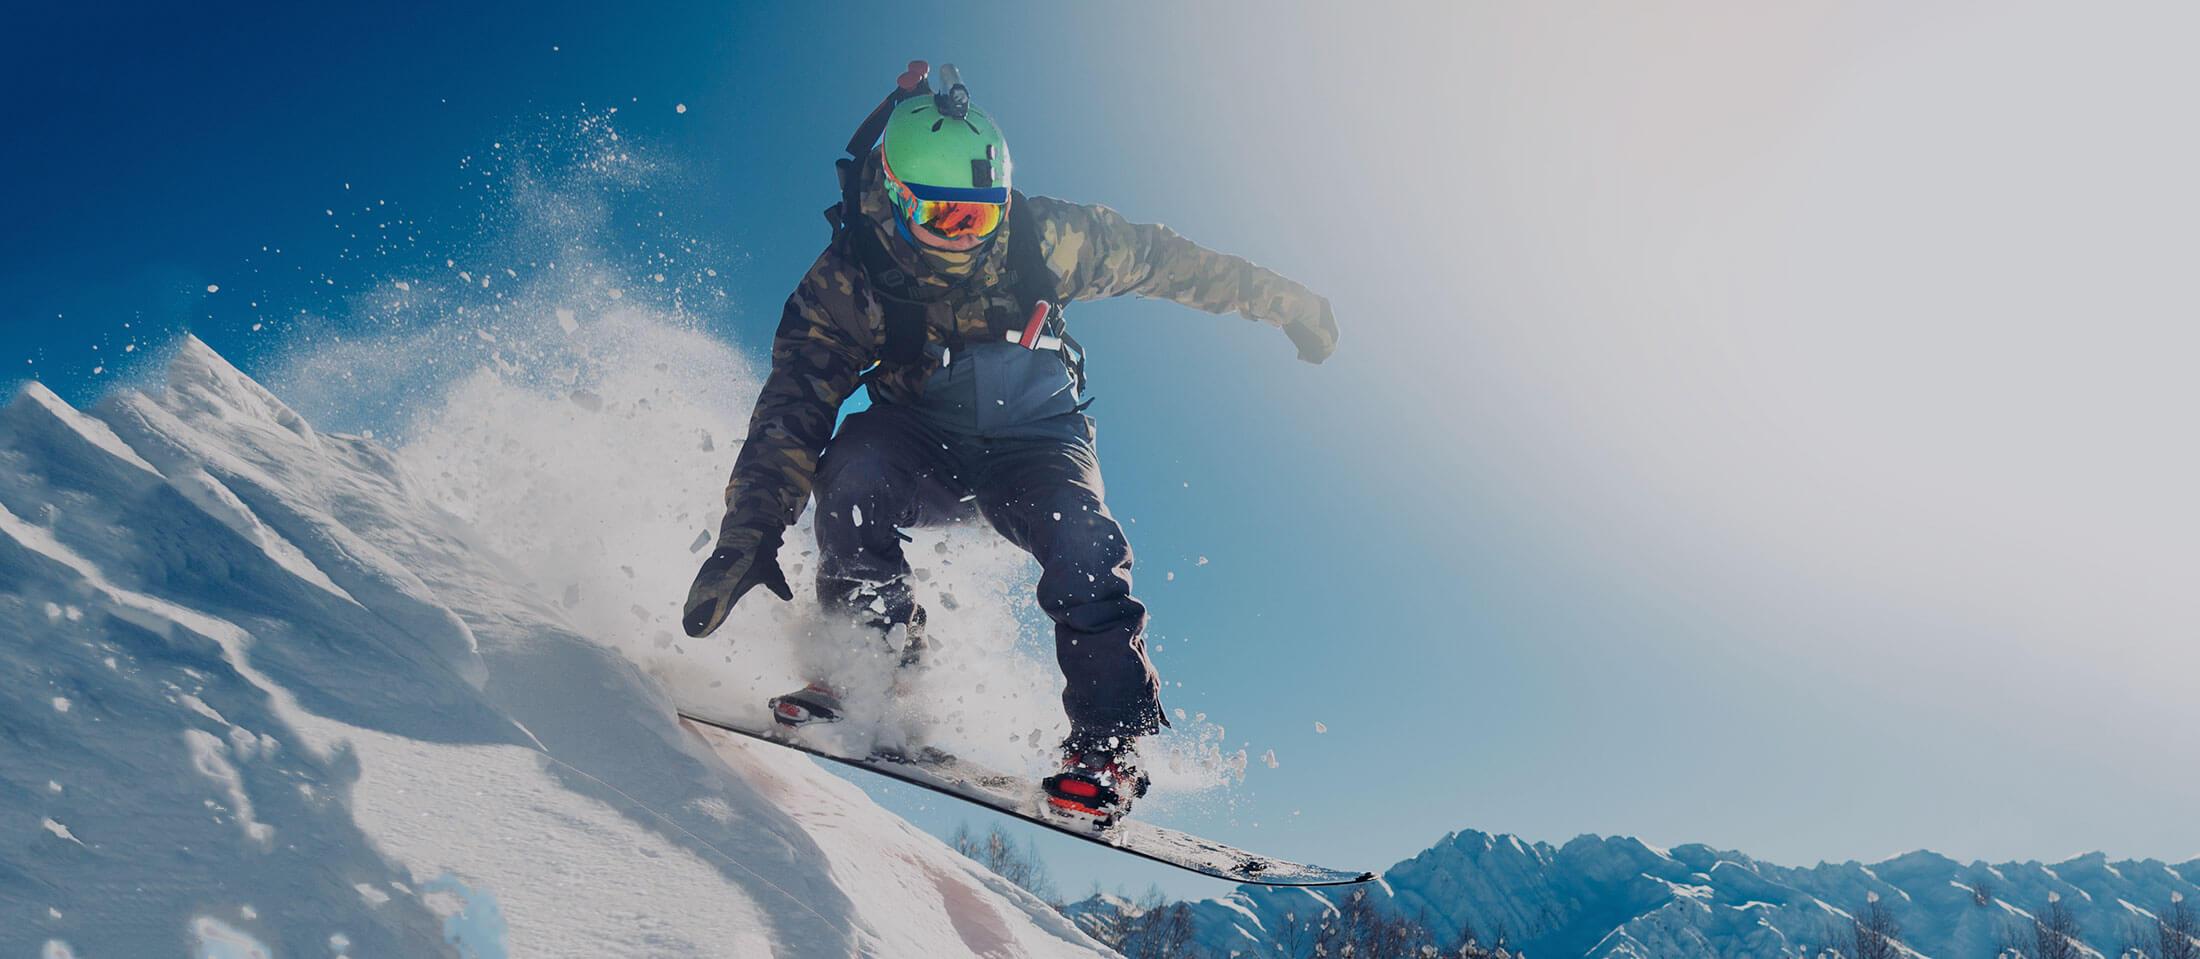 Home Page Snowboarder Slide